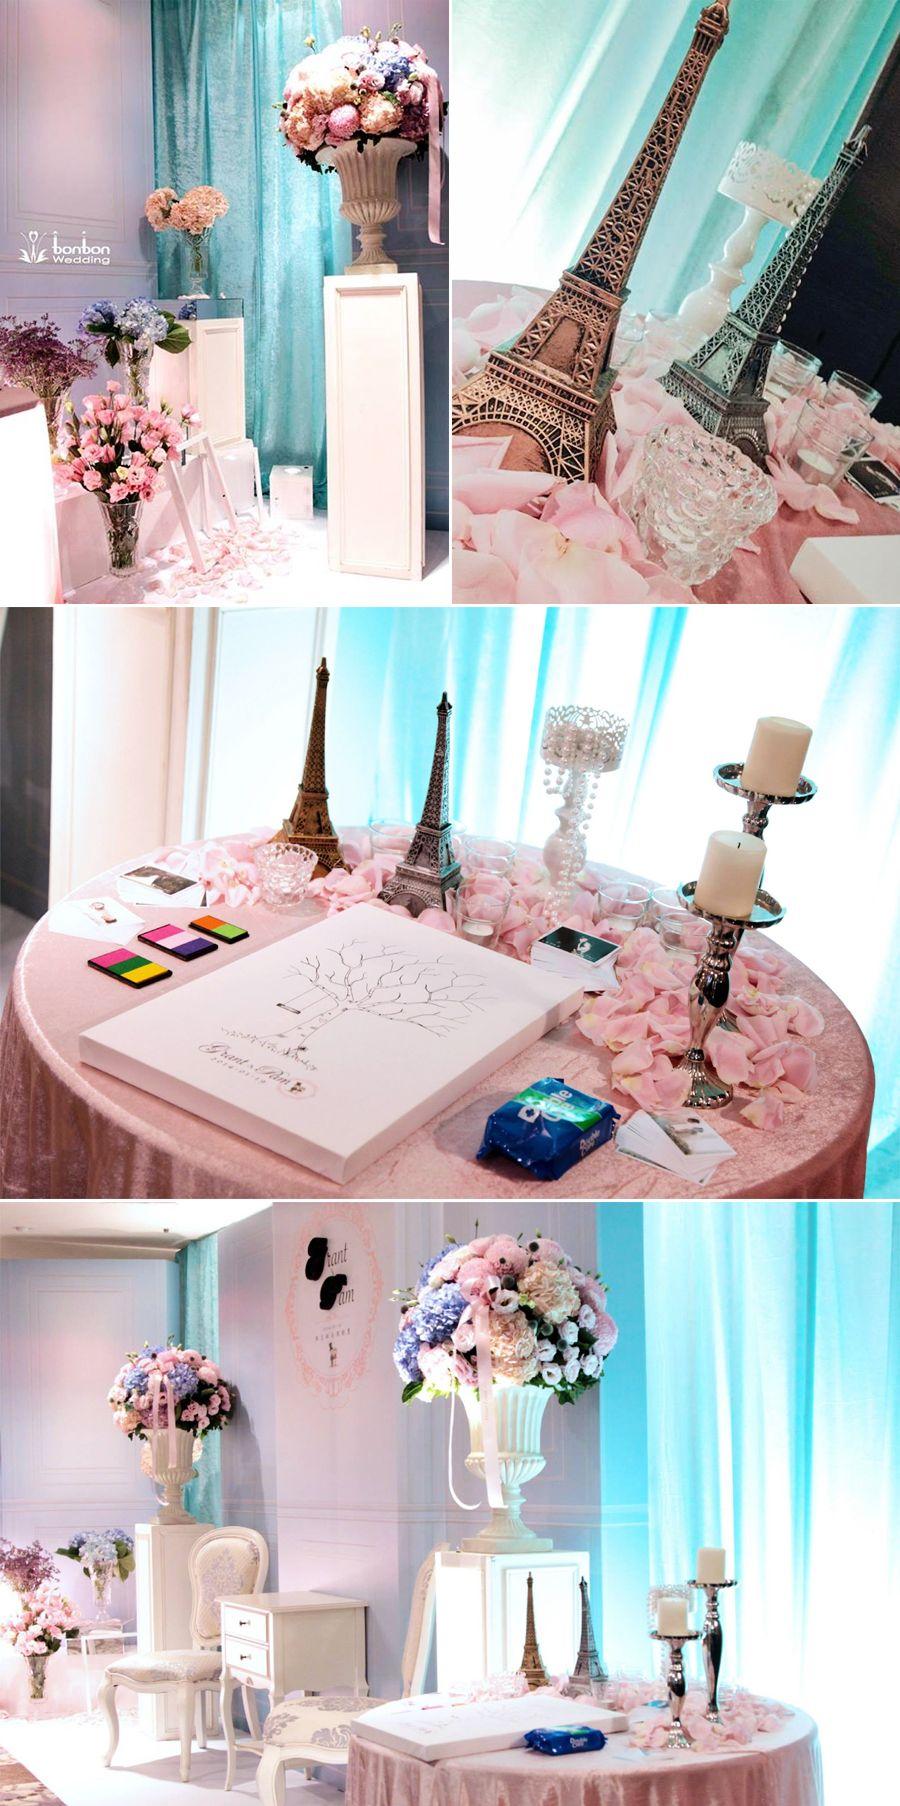 Blue Paris Reception Decor Theme Inspiration And Decorating Ideas